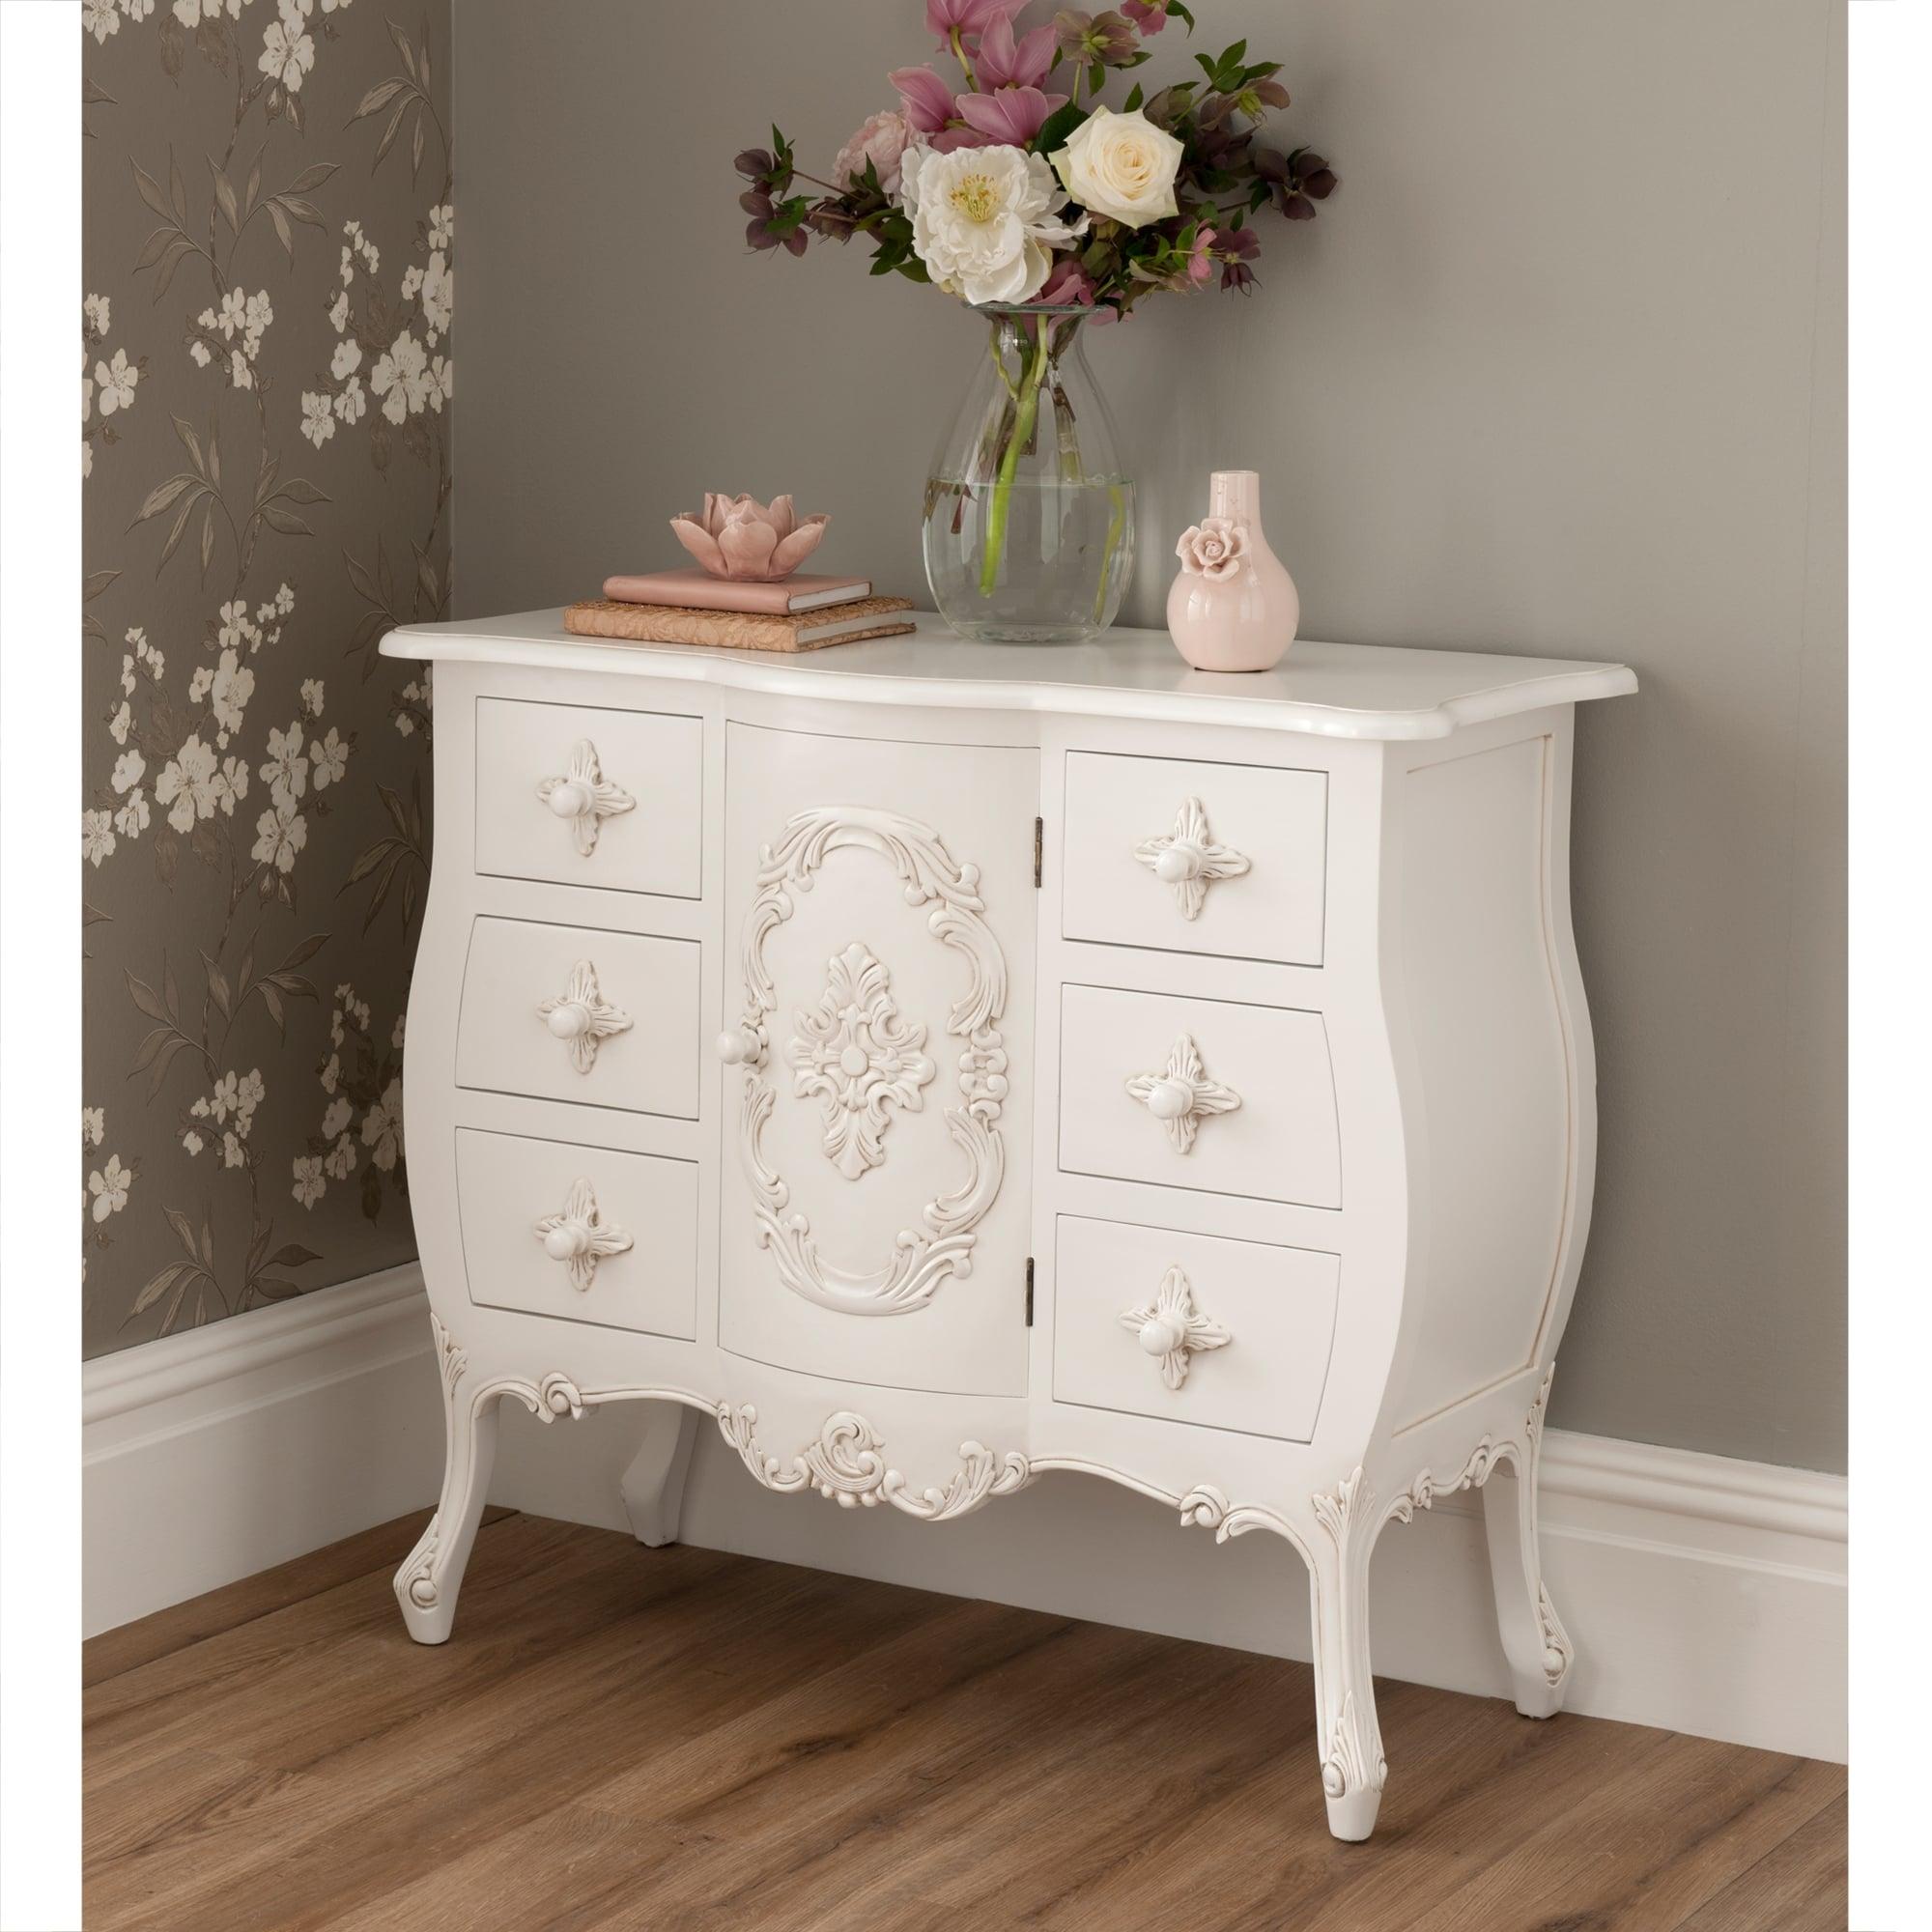 antique looking dresser painted la rochelle antique french style dresser